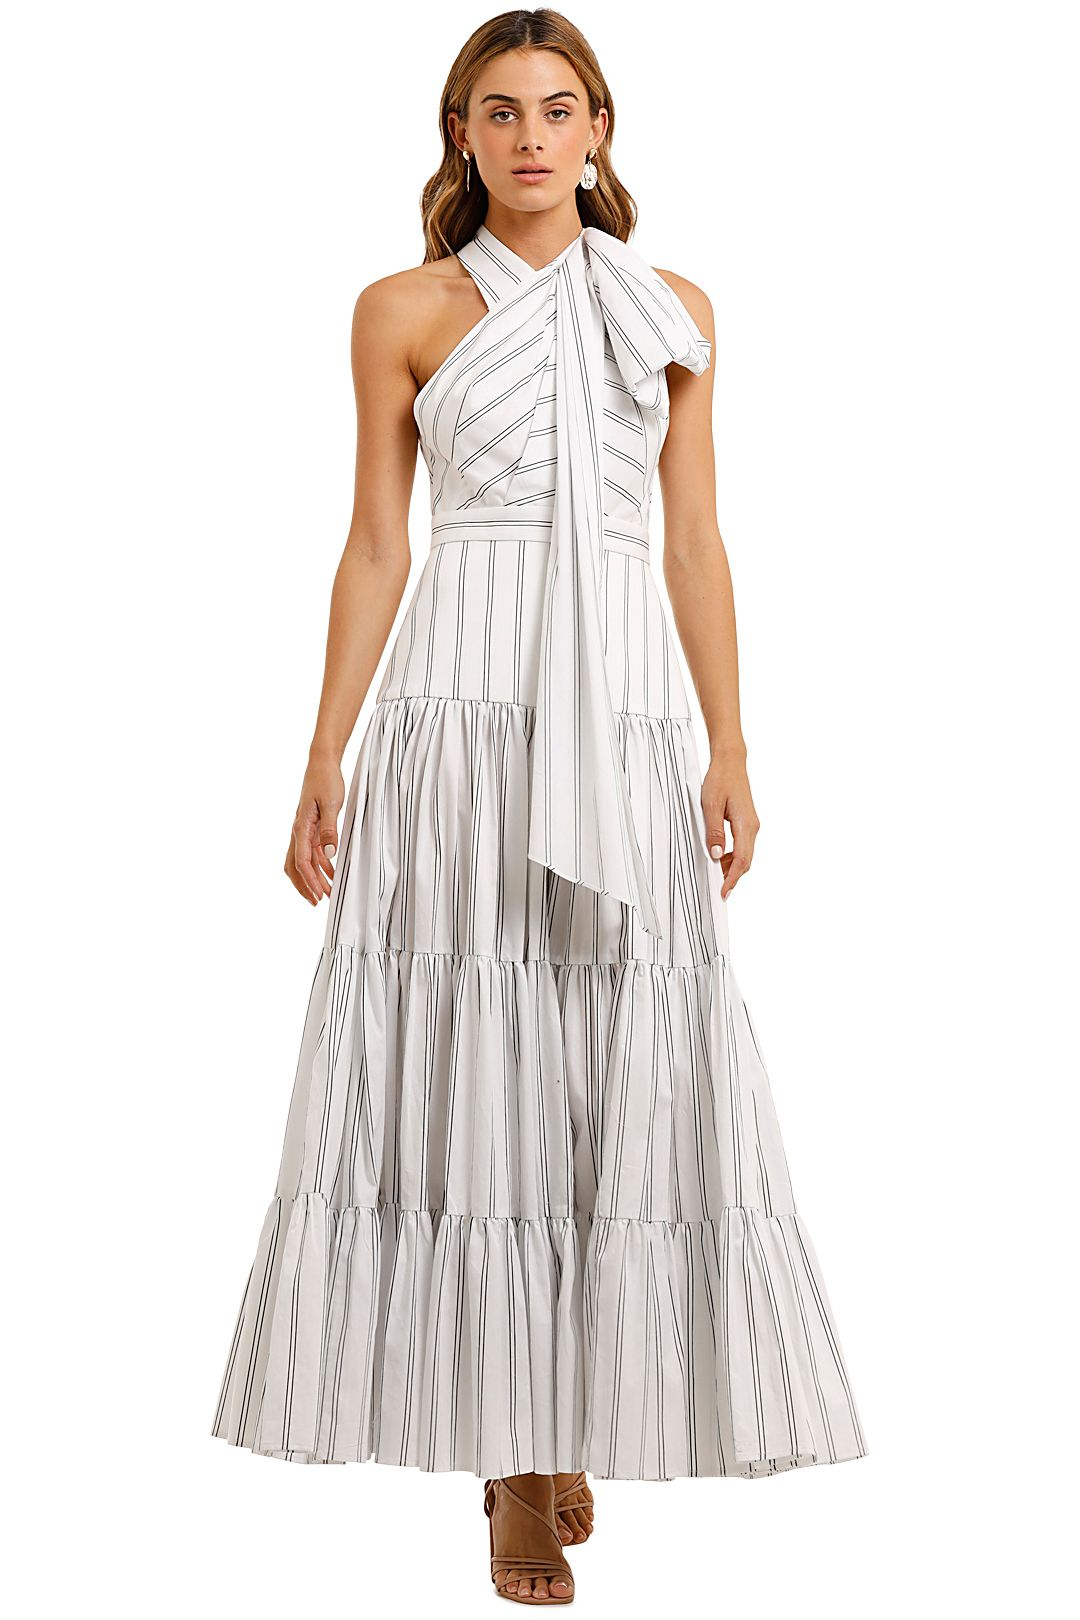 Acler Eleanor Dress